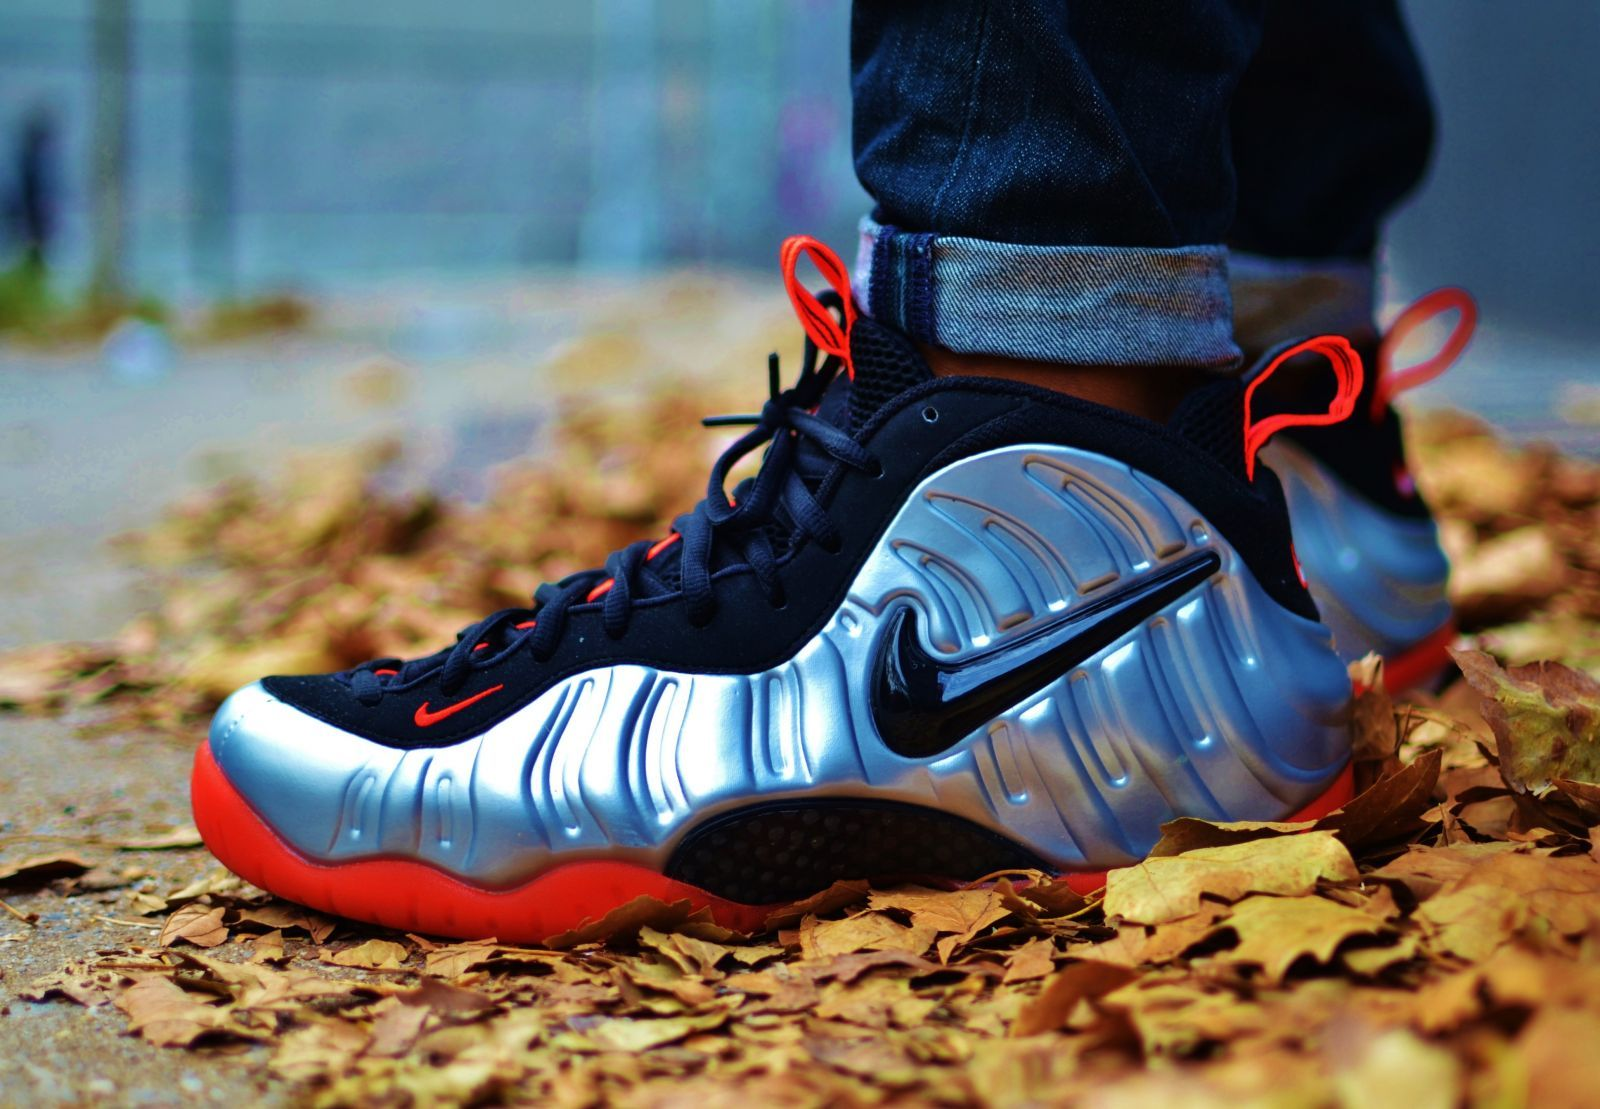 Sneakers men fashion, Hype shoes